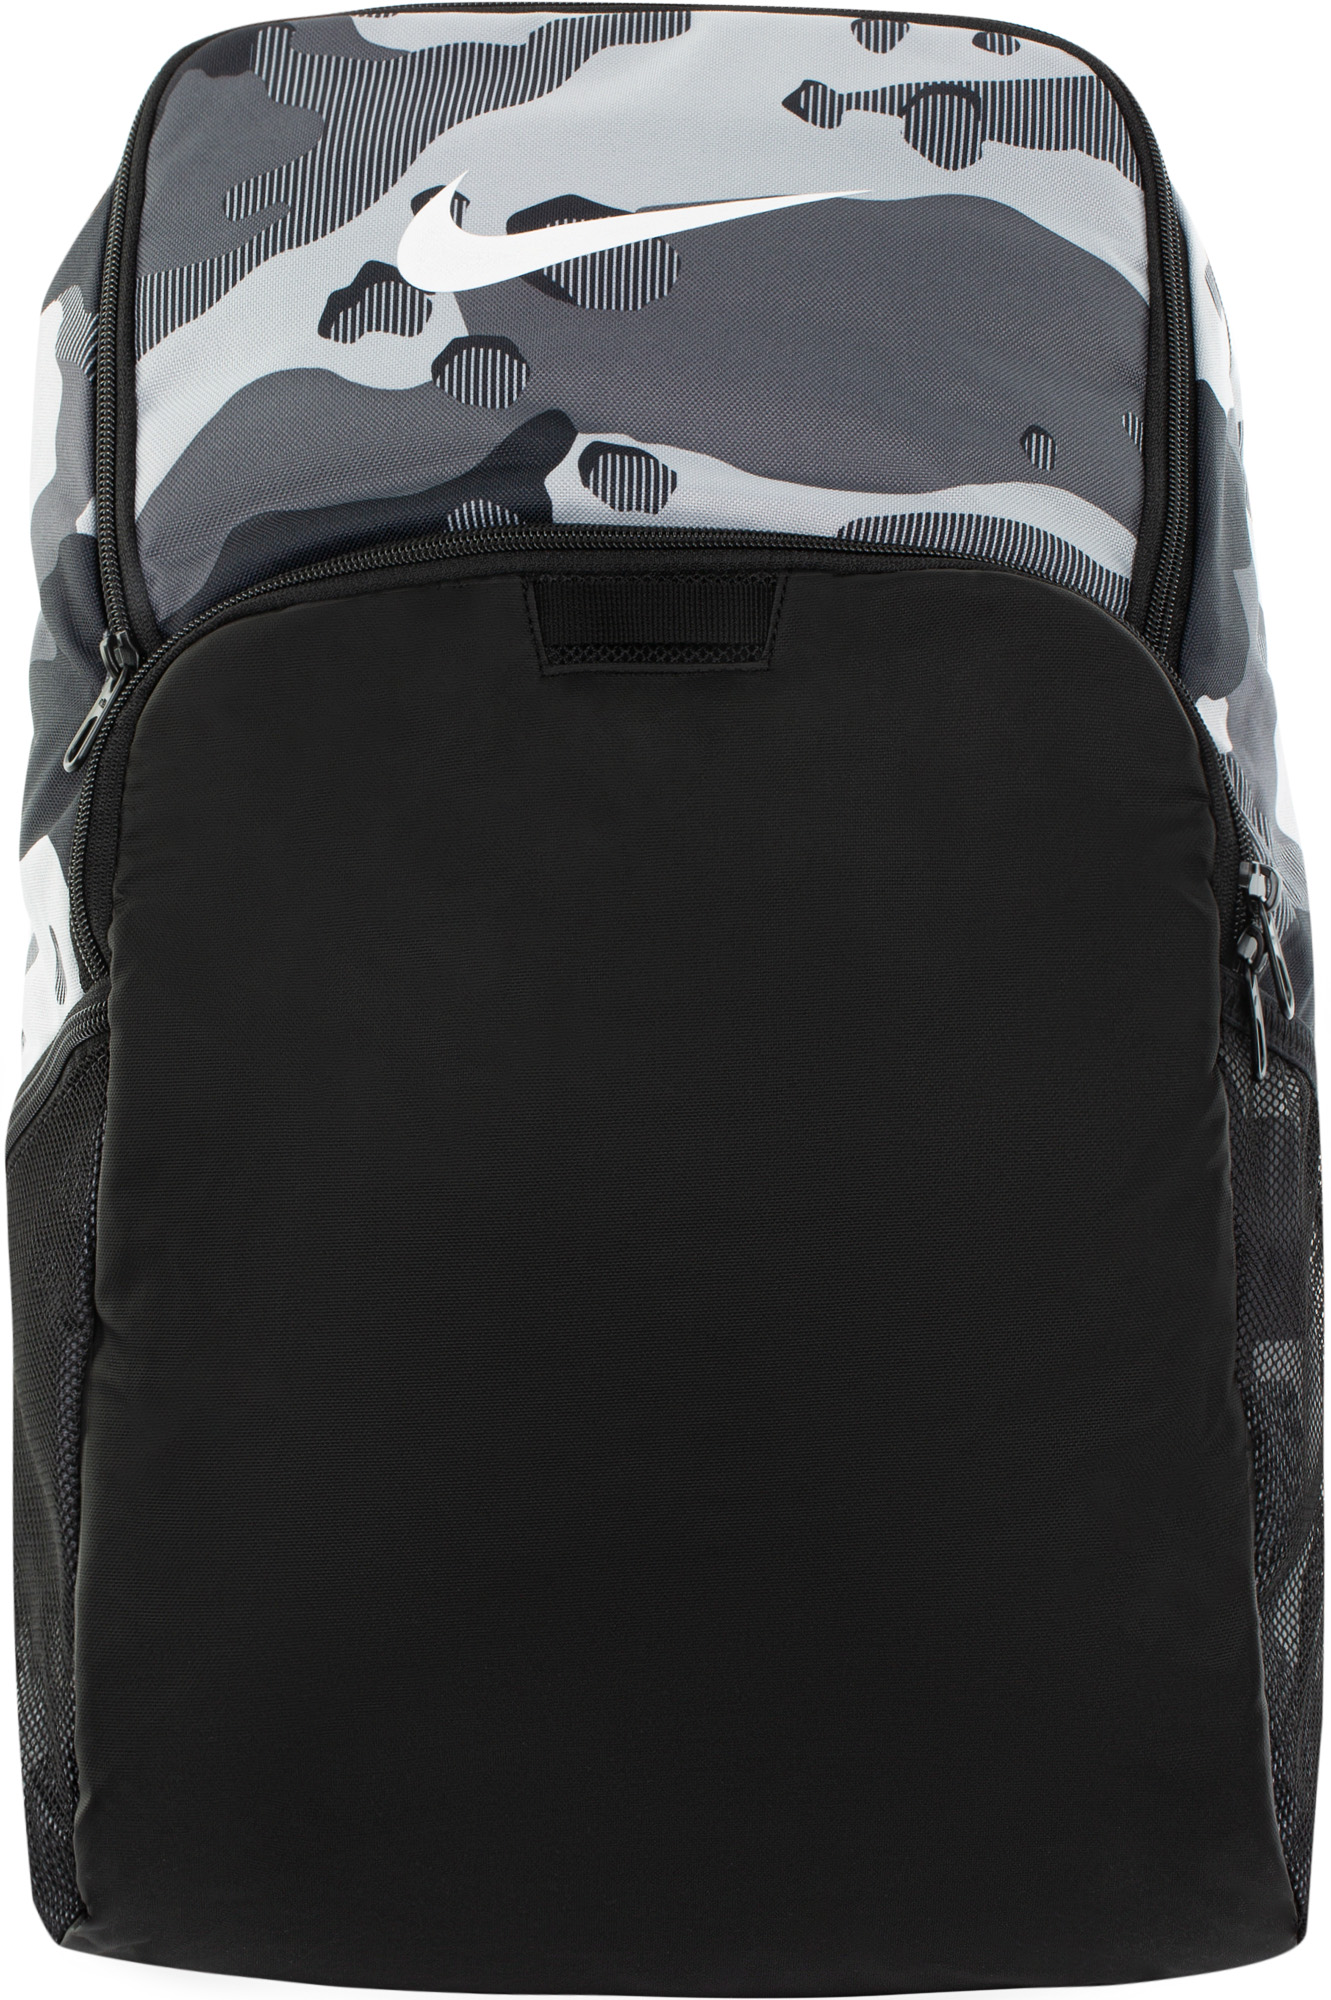 цена на Nike Рюкзак Nike Brasilia Backpack